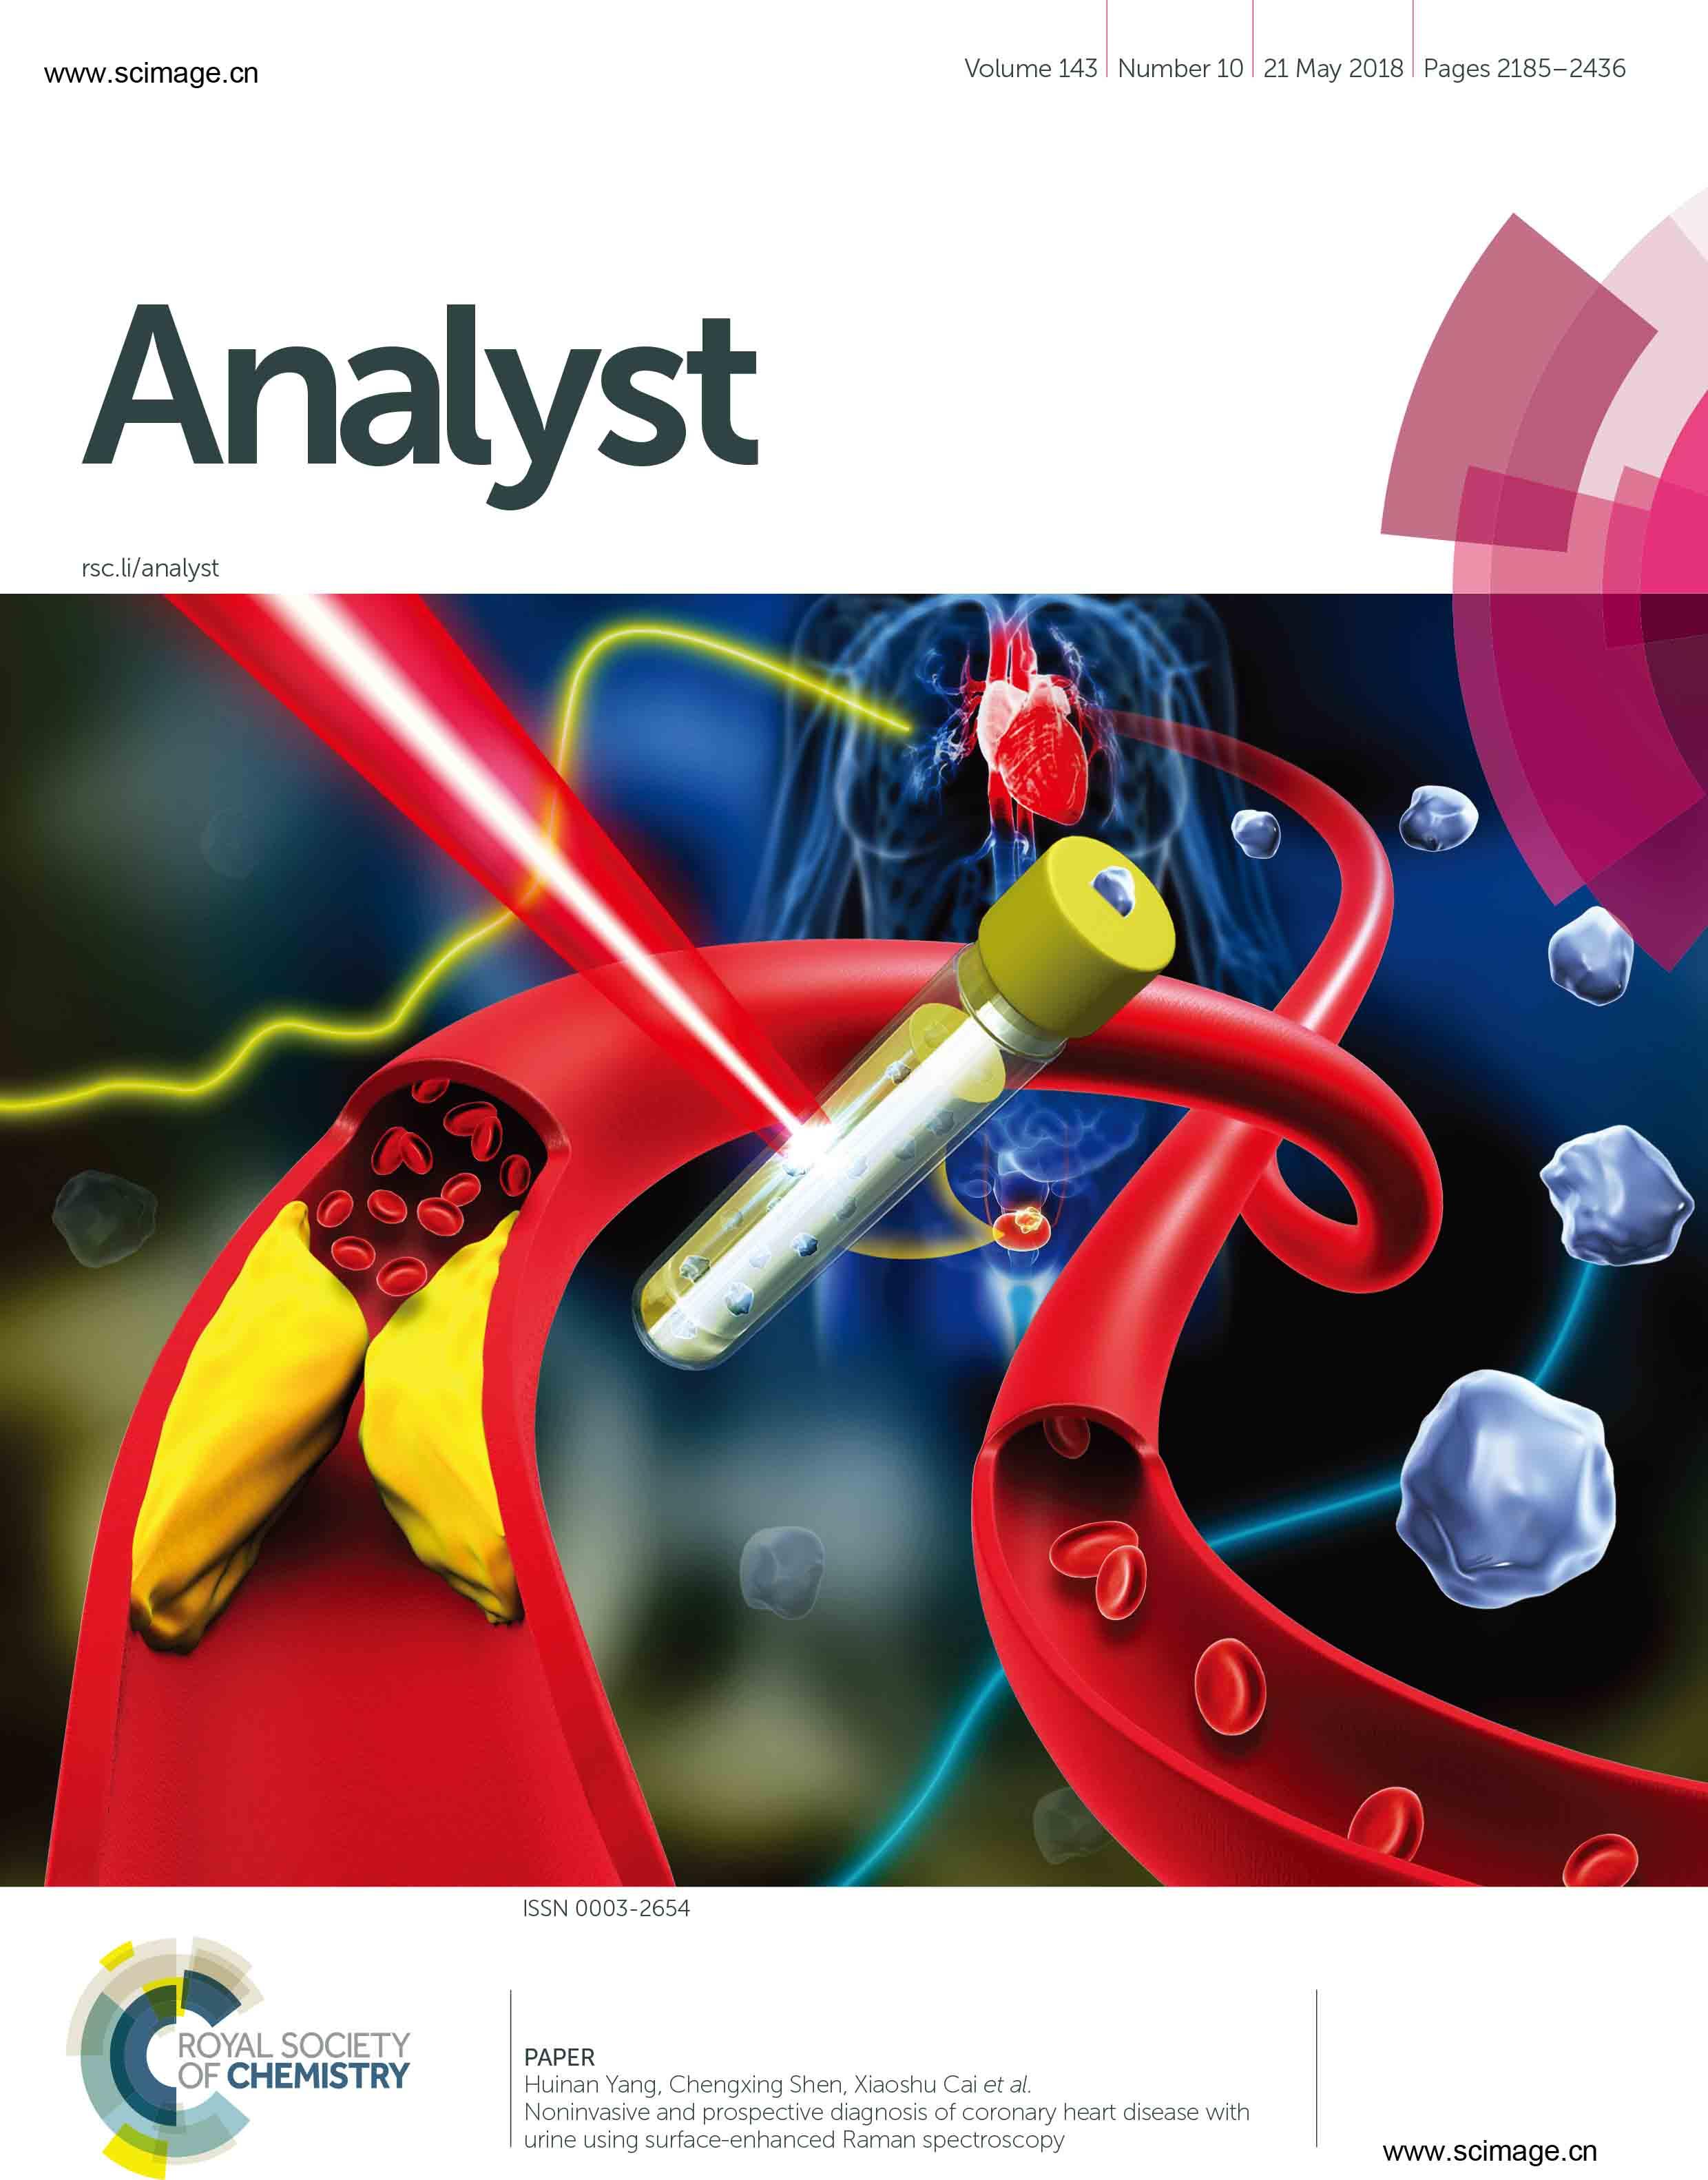 Noninvasive and prospective diagnosis of coronary heart disease with urine using surface-enhanced Raman spectroscopy